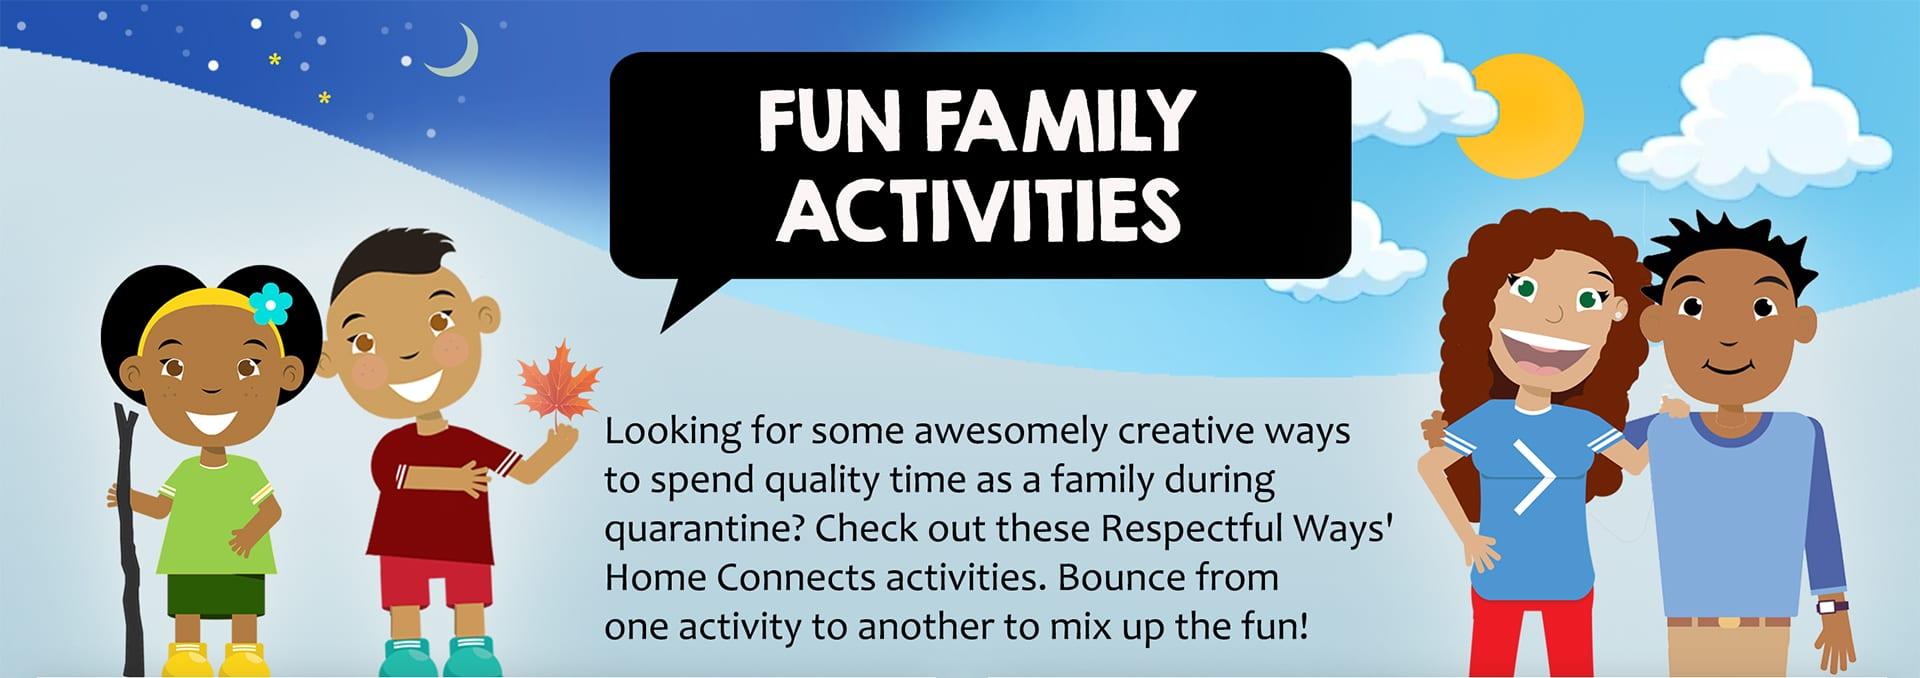 Respectful Ways Fun Family Activities